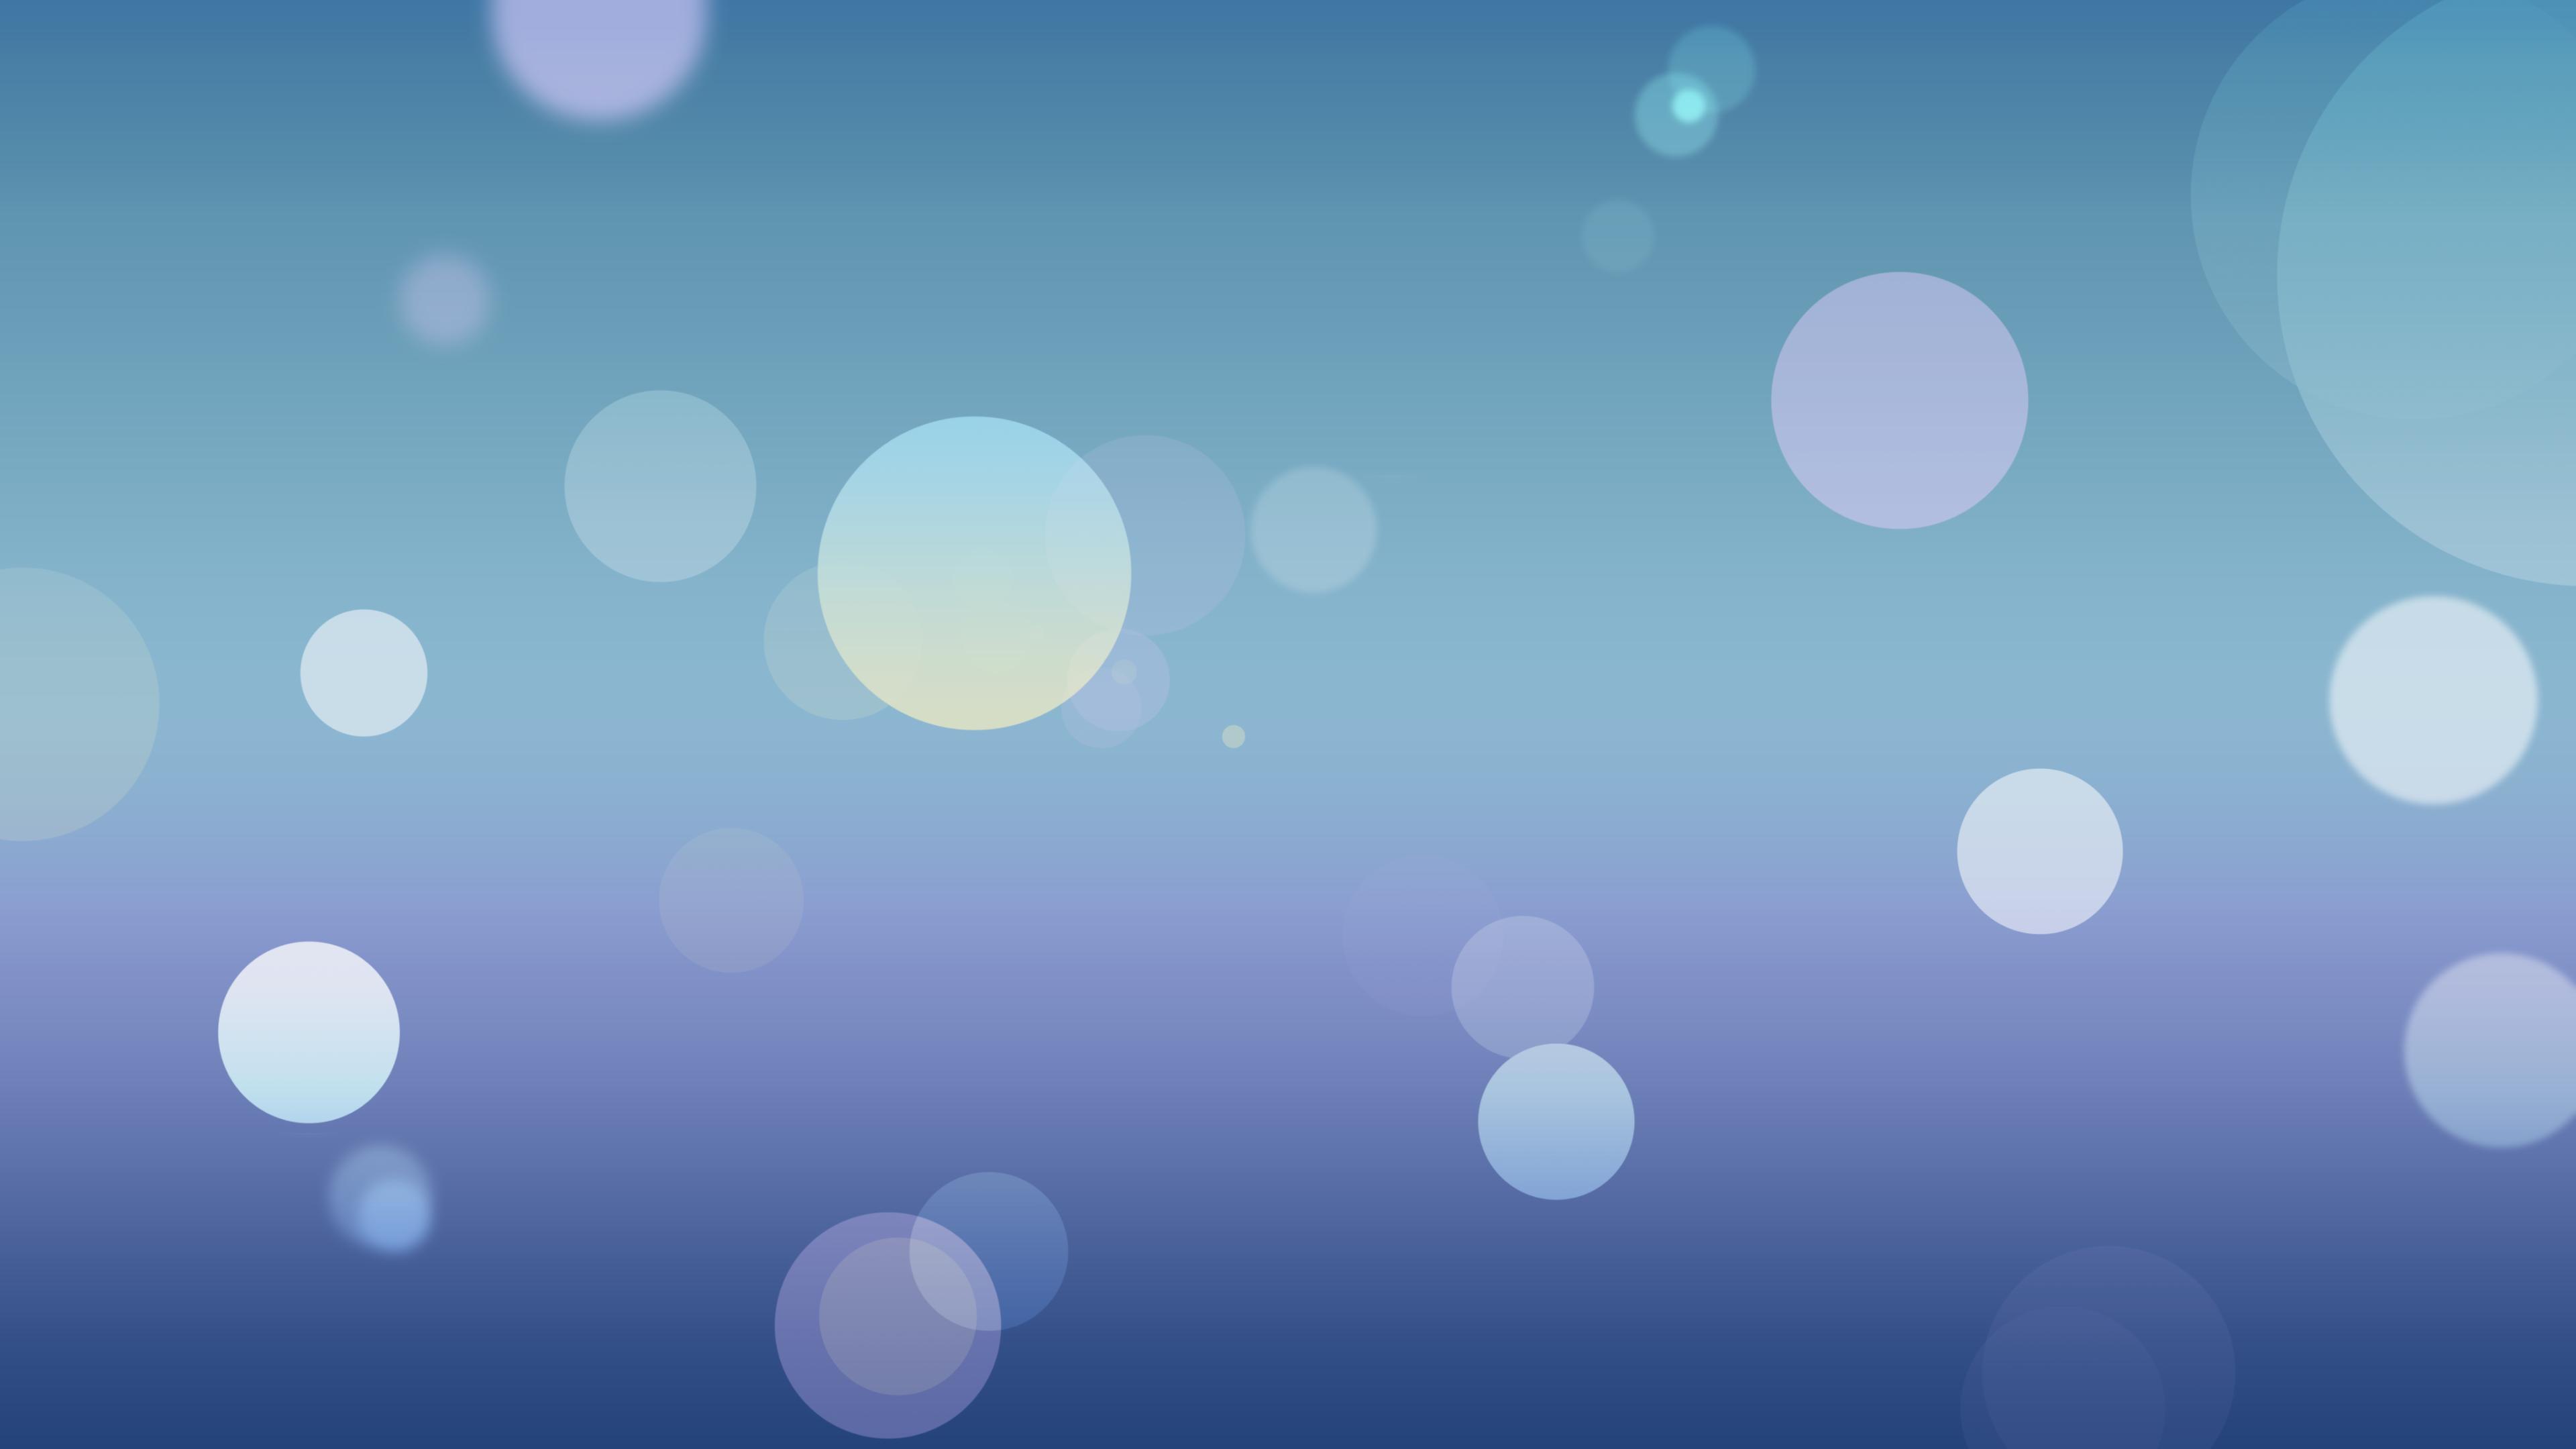 ios 7 style desktop wallpaper 3840x2160